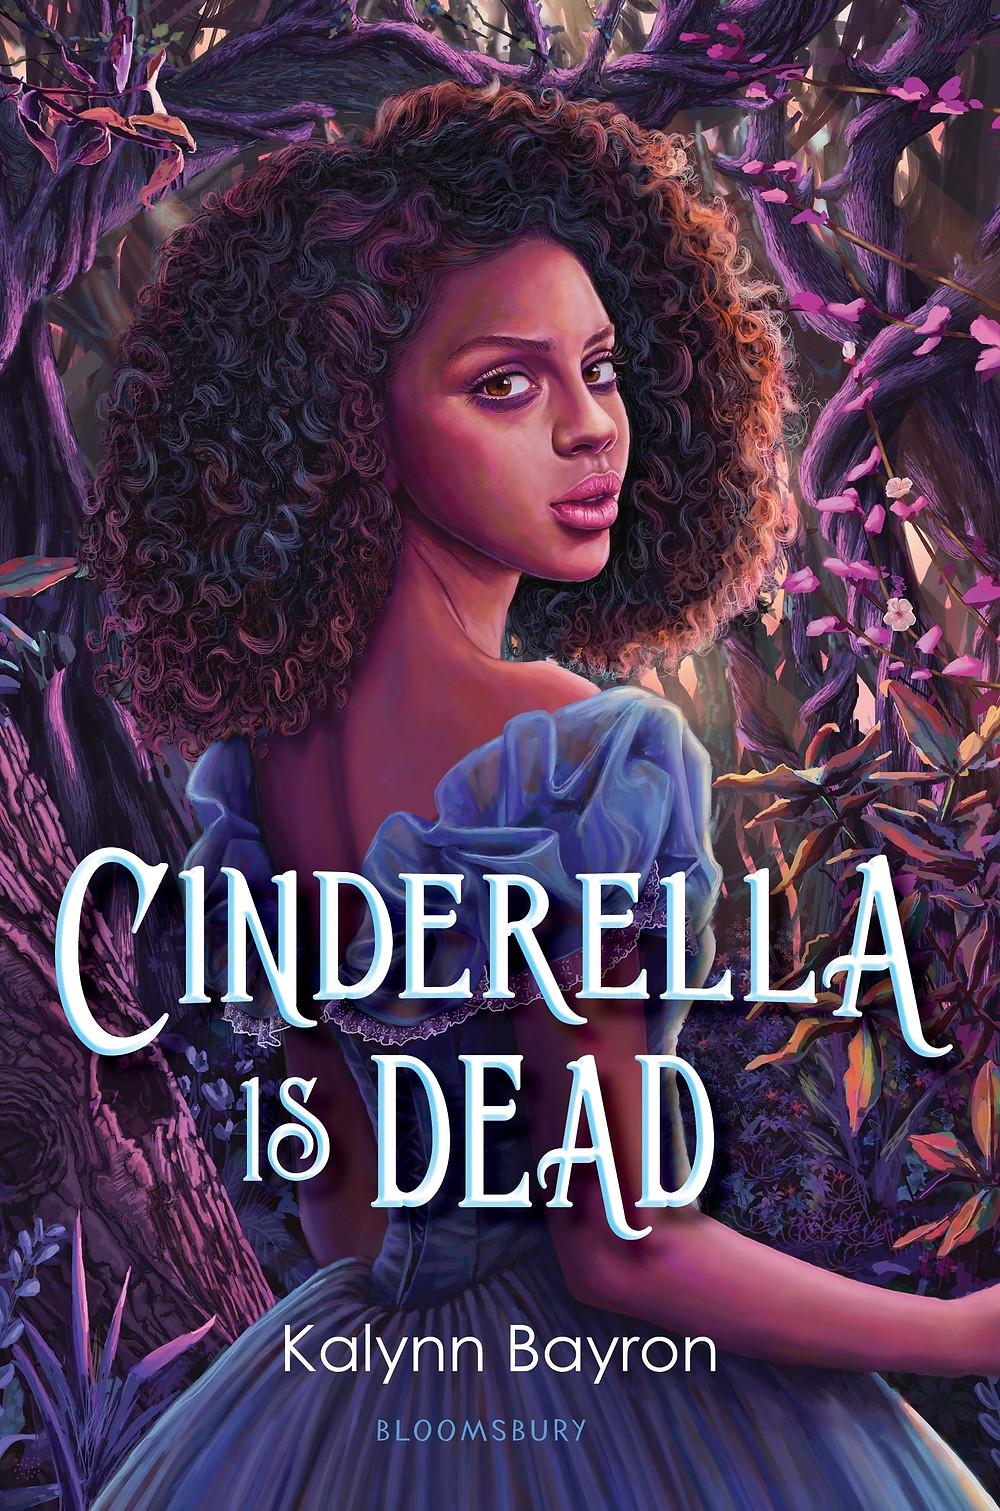 Book cover of Cinderella is Dead by Kalynn Bayron